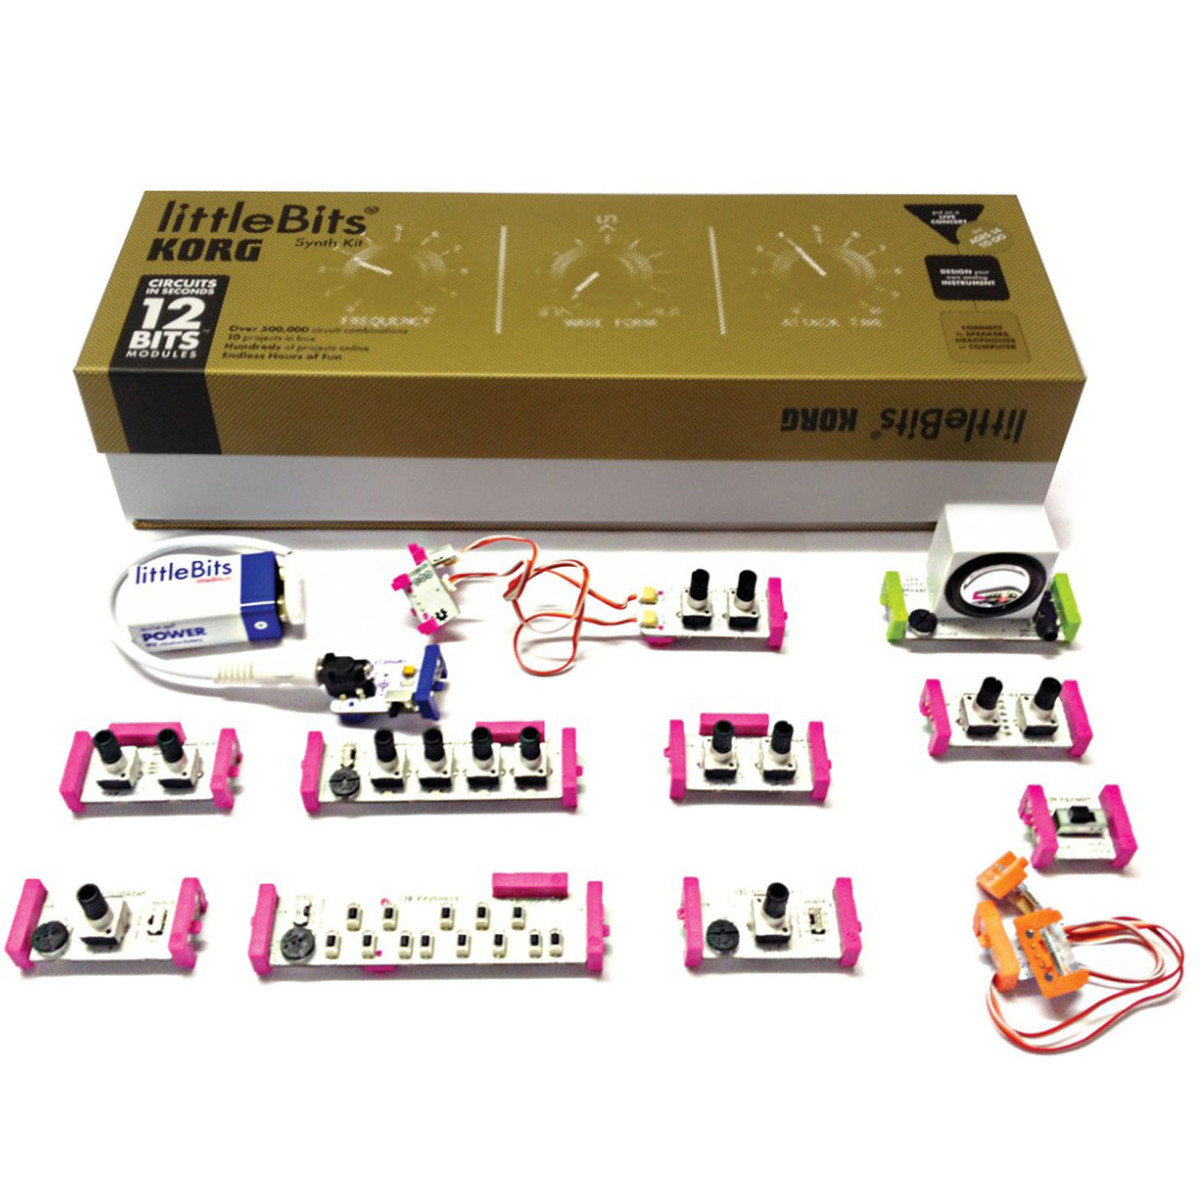 Image of Korg LittleBits Analog Synth Kit